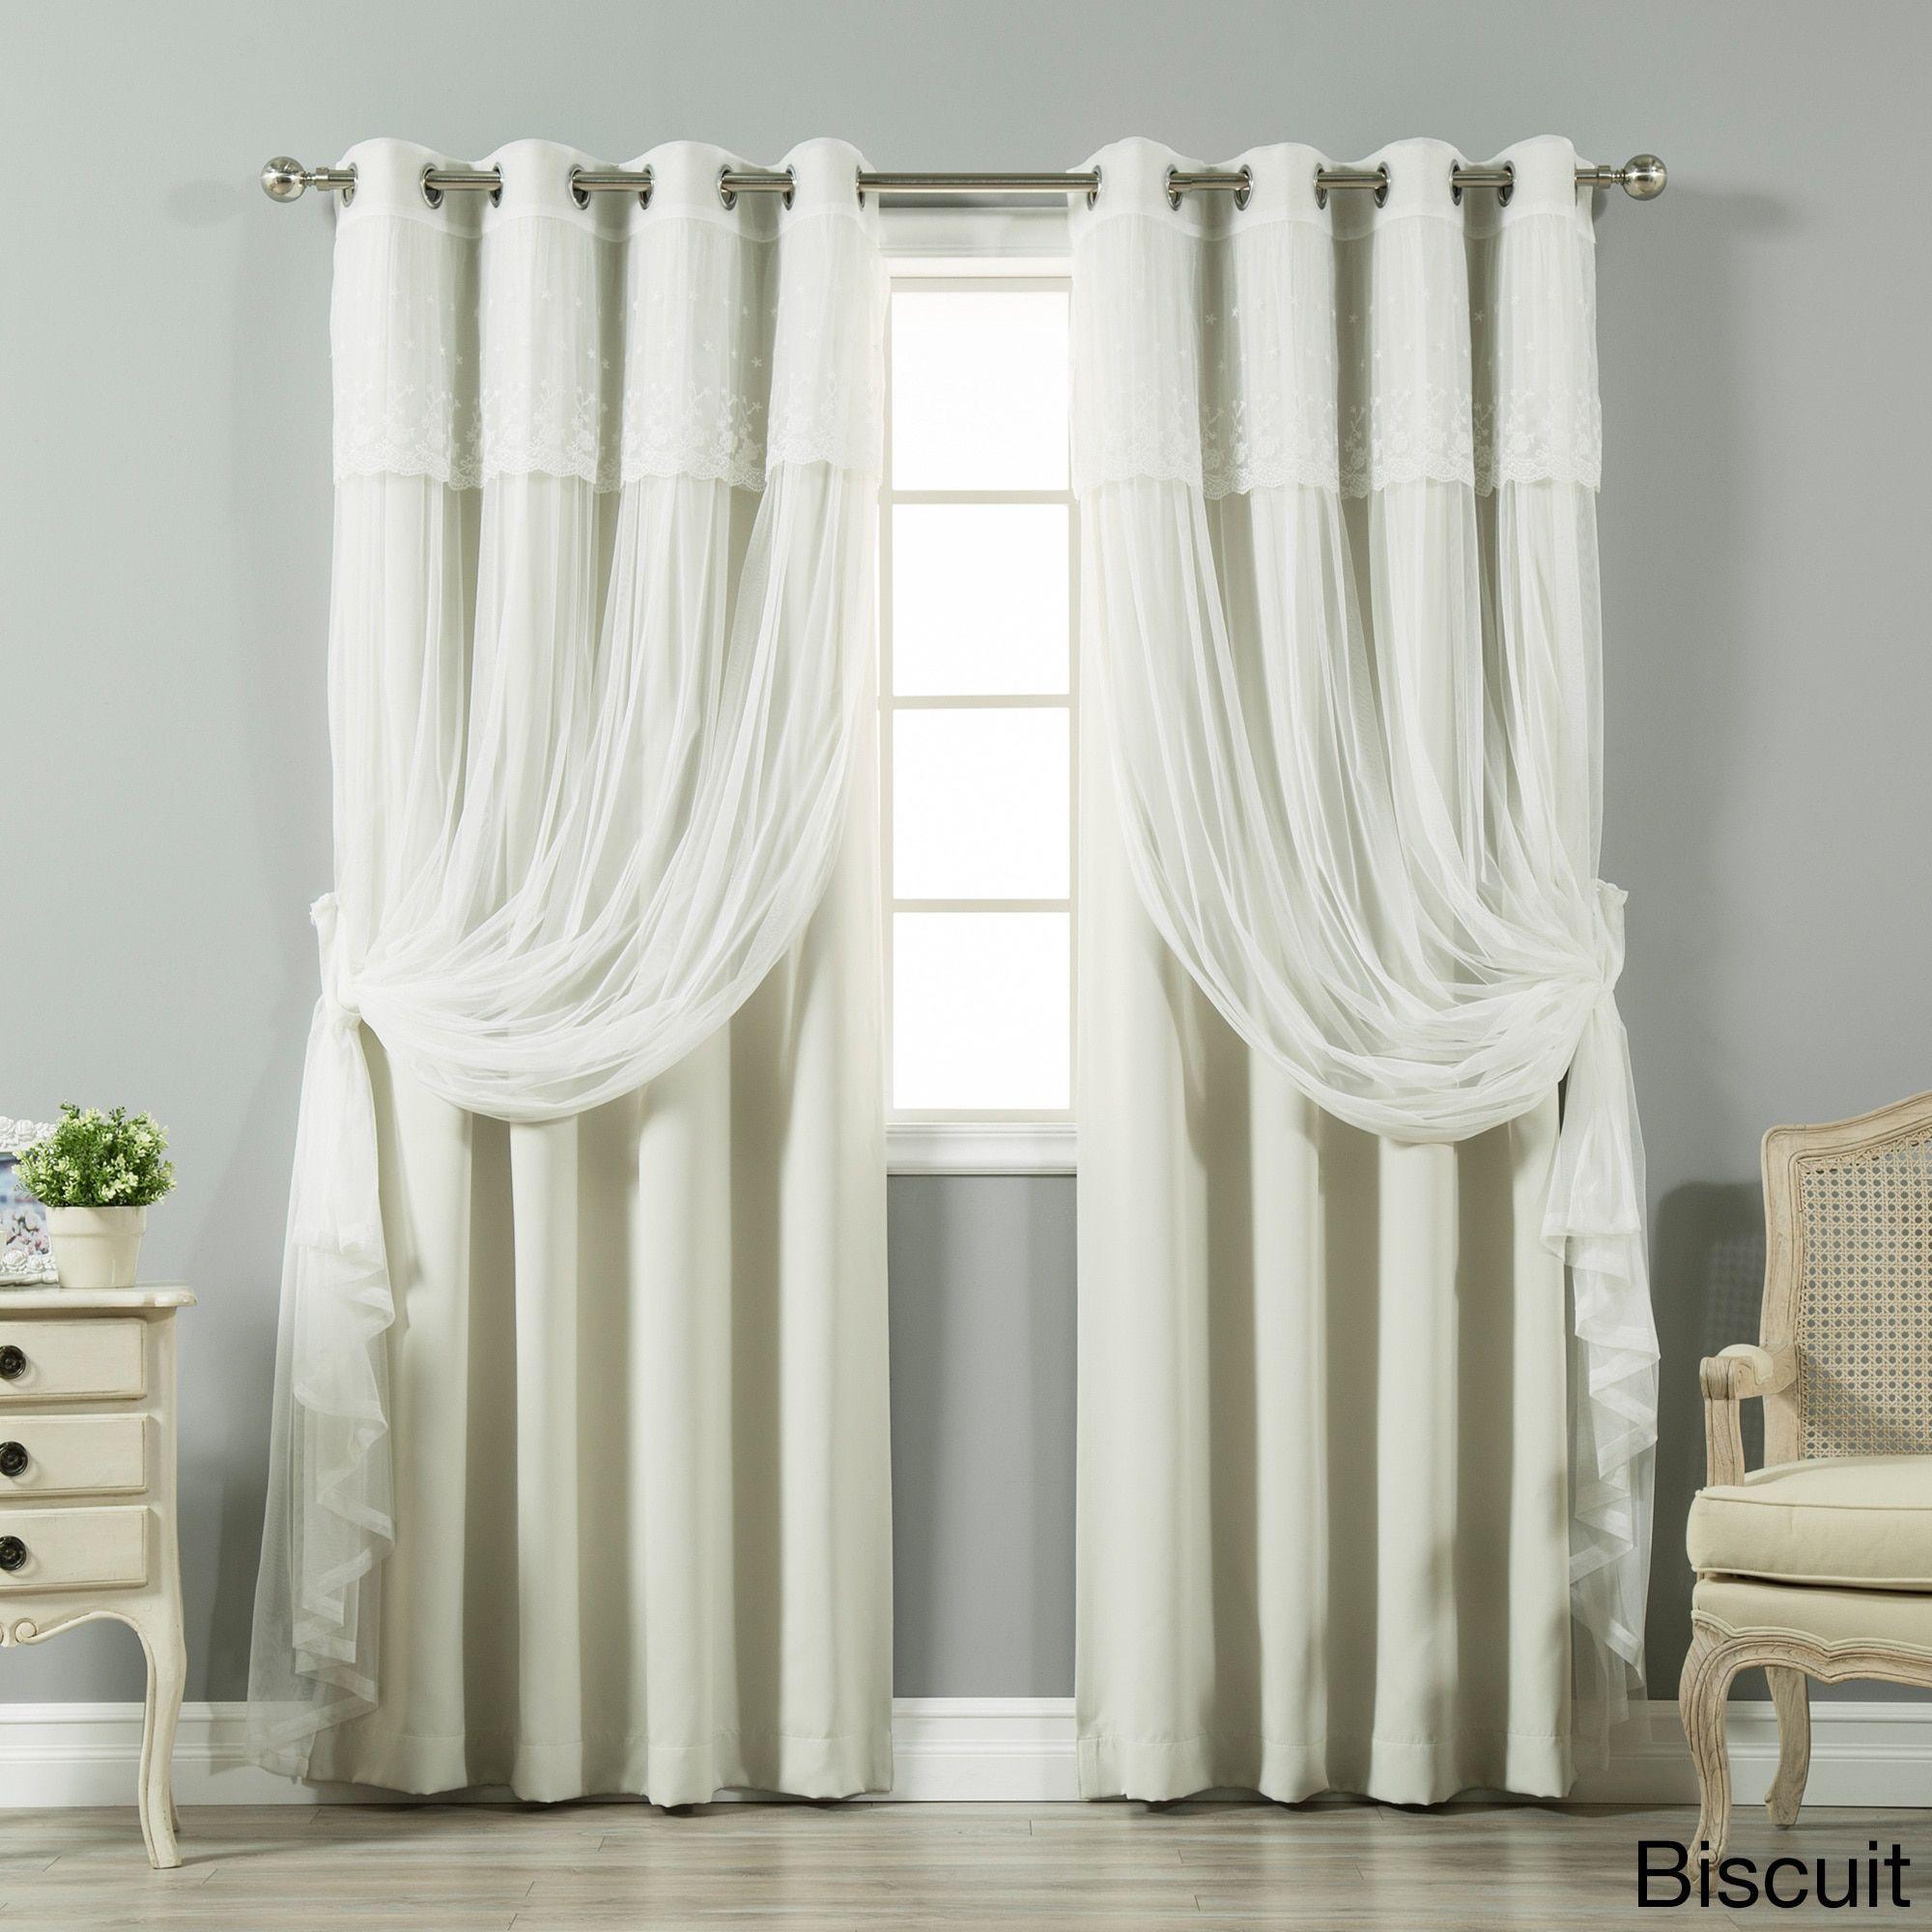 Drop Cloth Curtains Sliding Glass Door